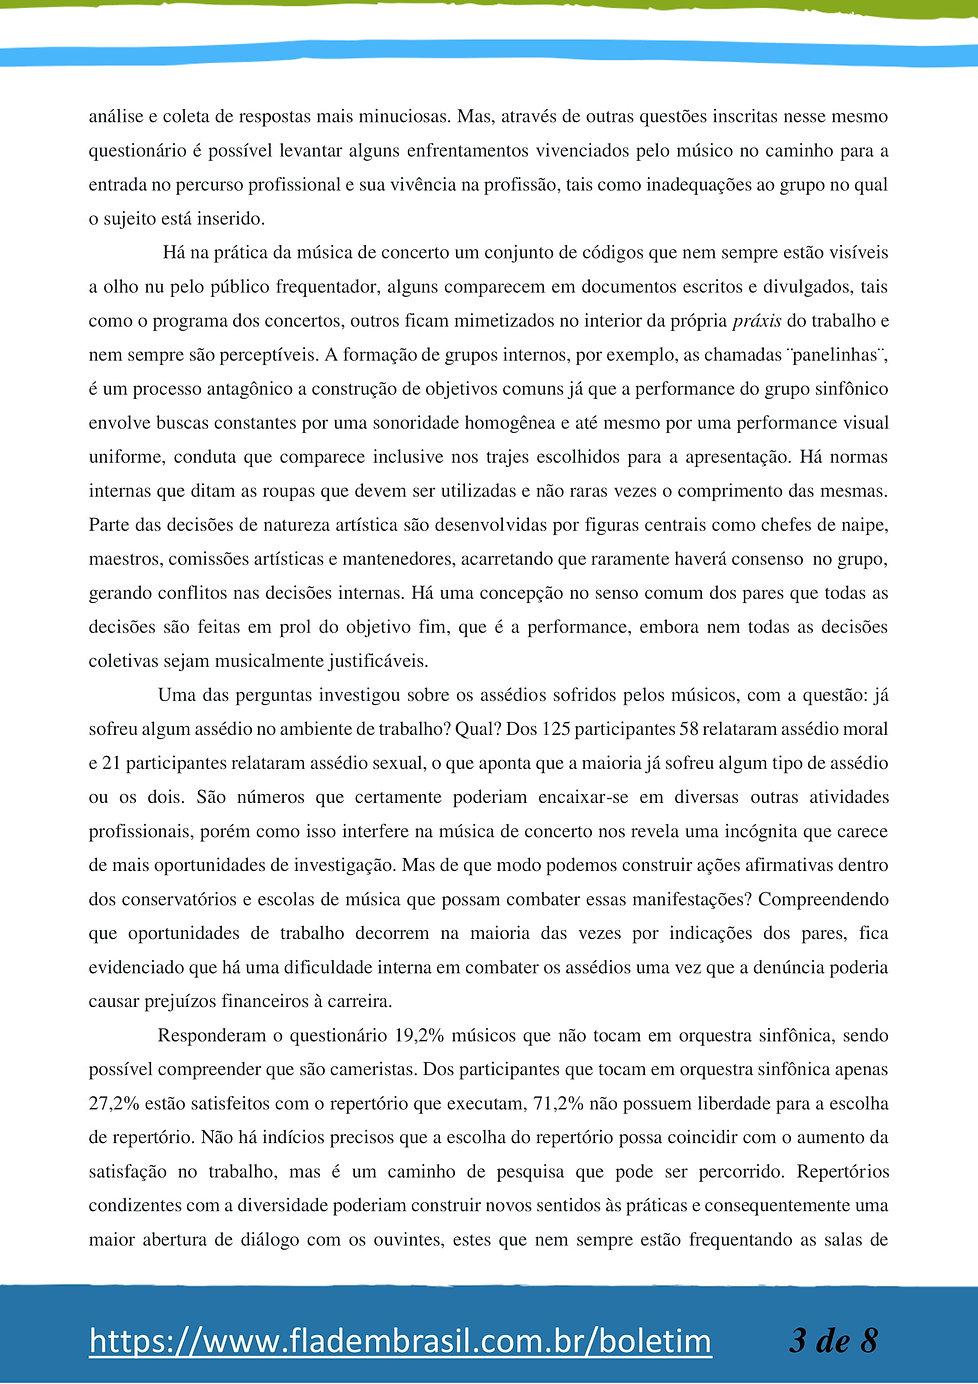 Boletim 02 diagramado - Hudson Lima-3.jp